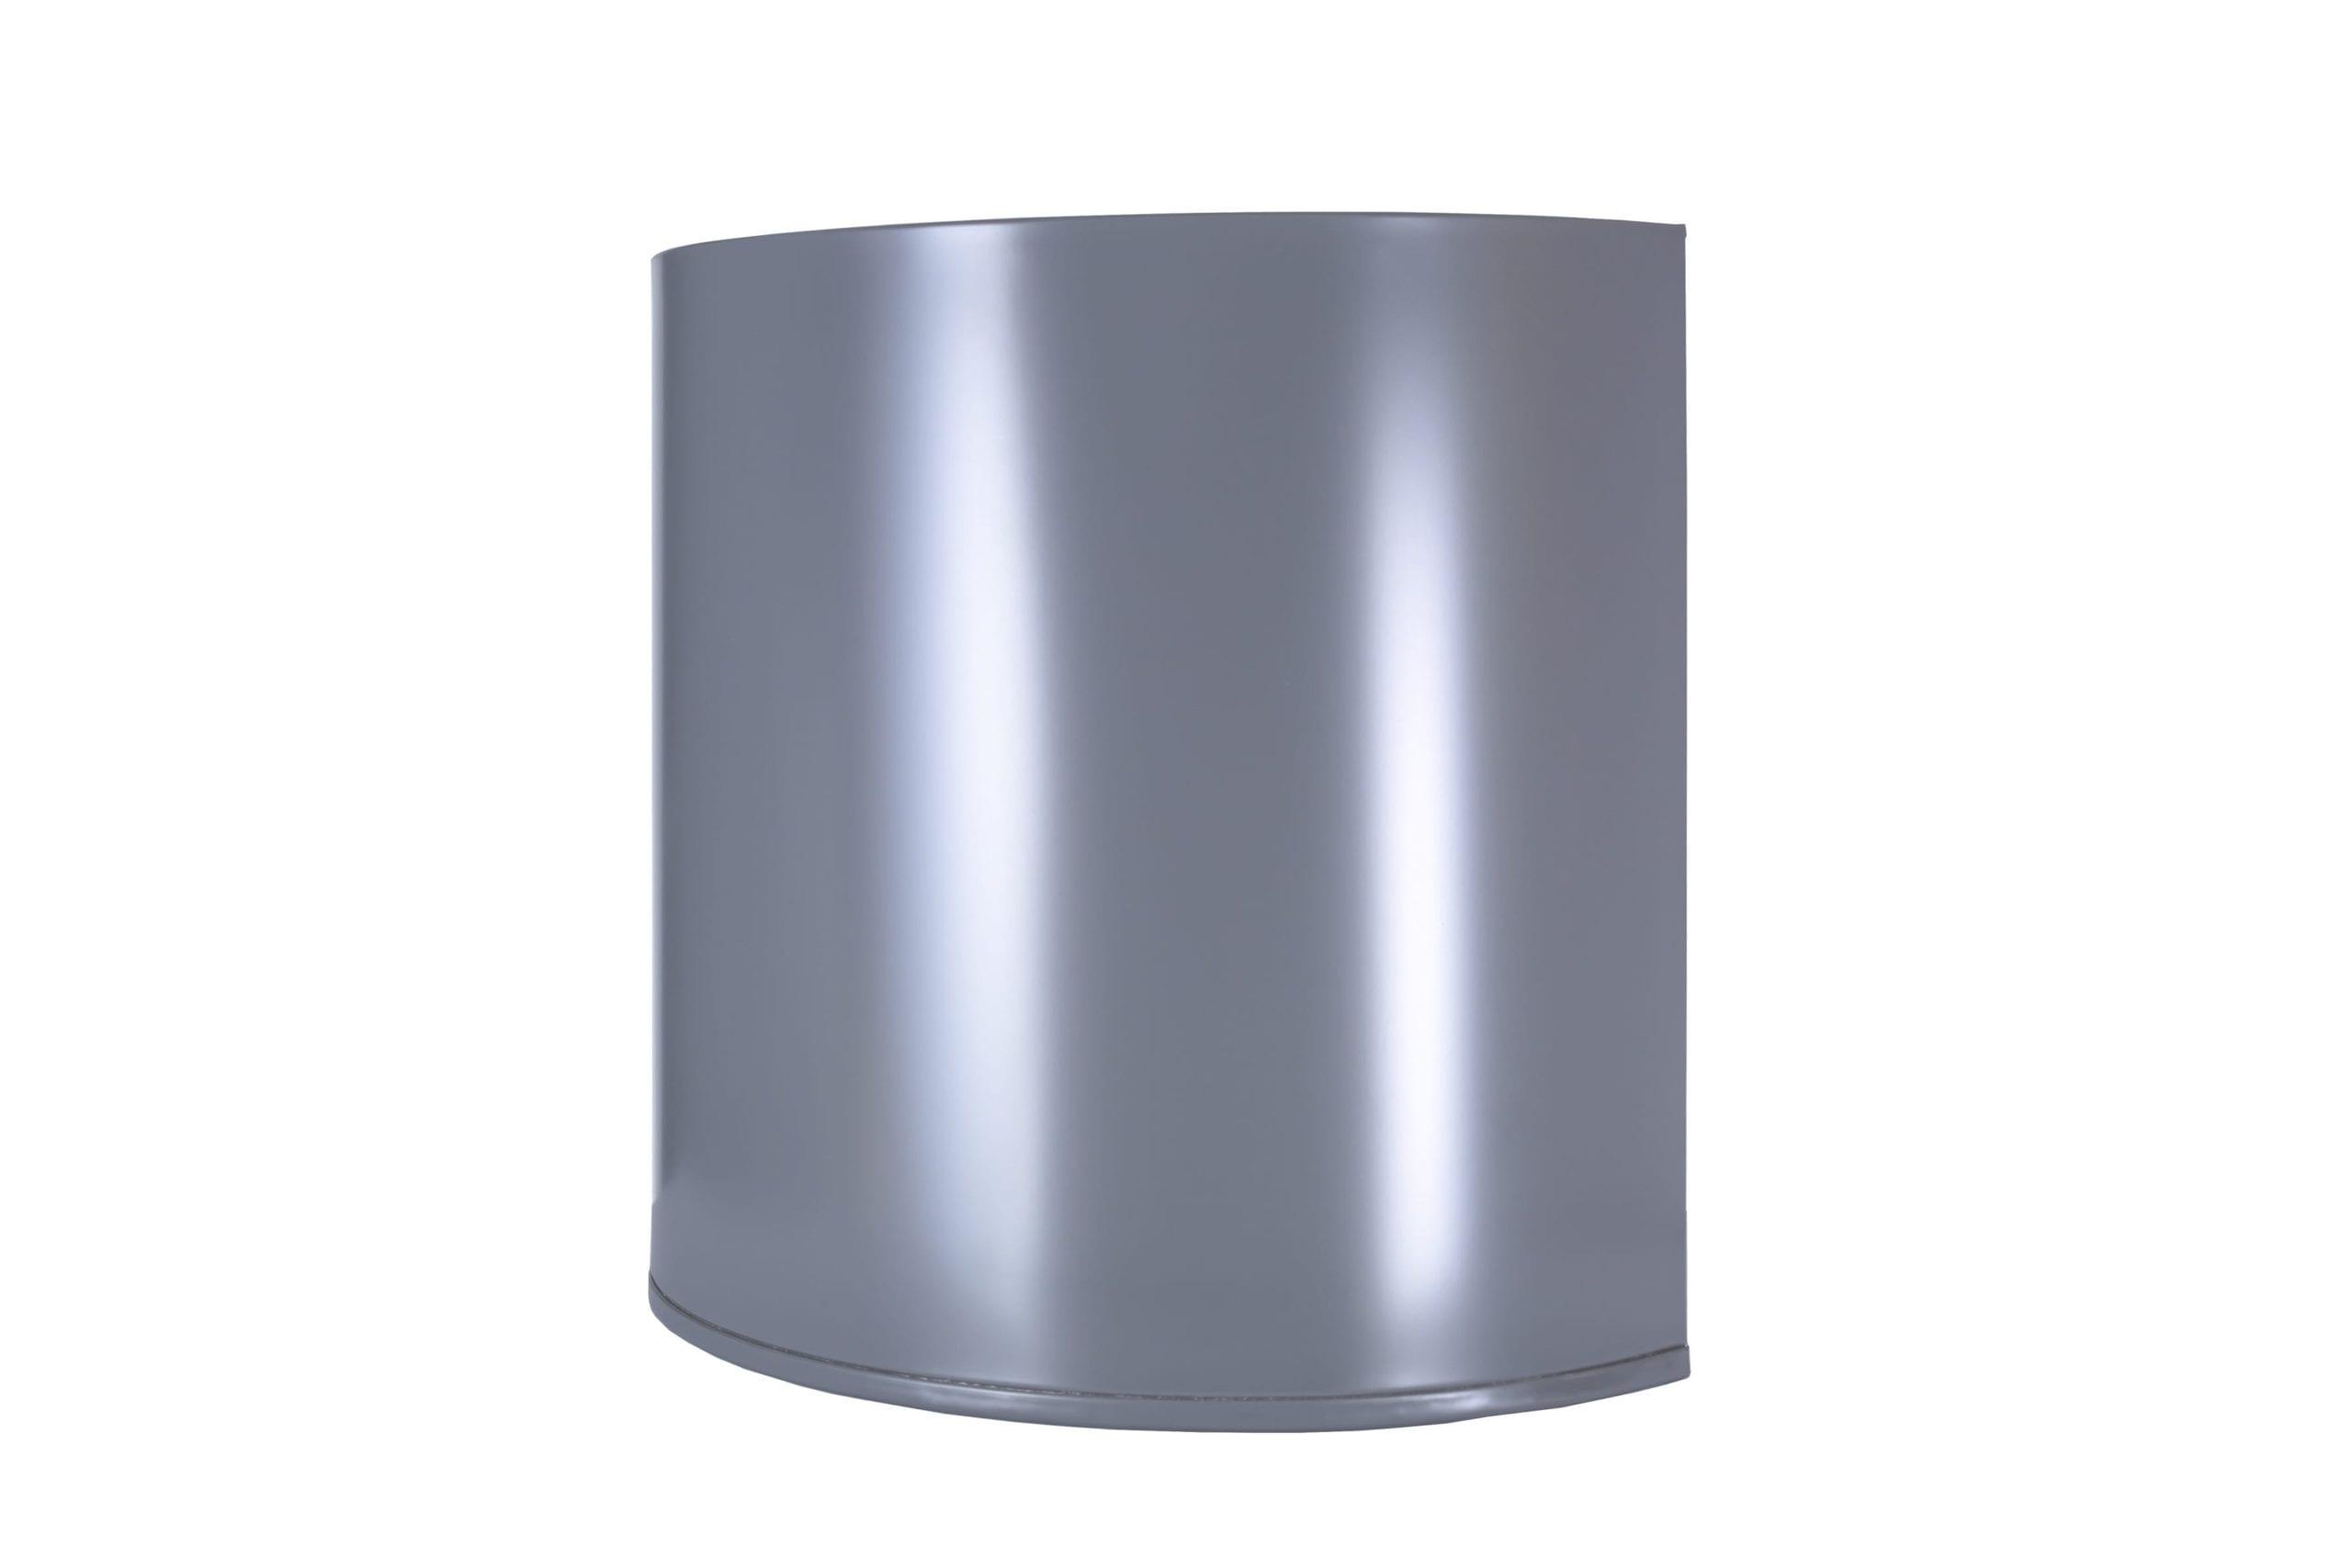 Medium Ned Kelly Metal Rainwater Head Roof Ventilation